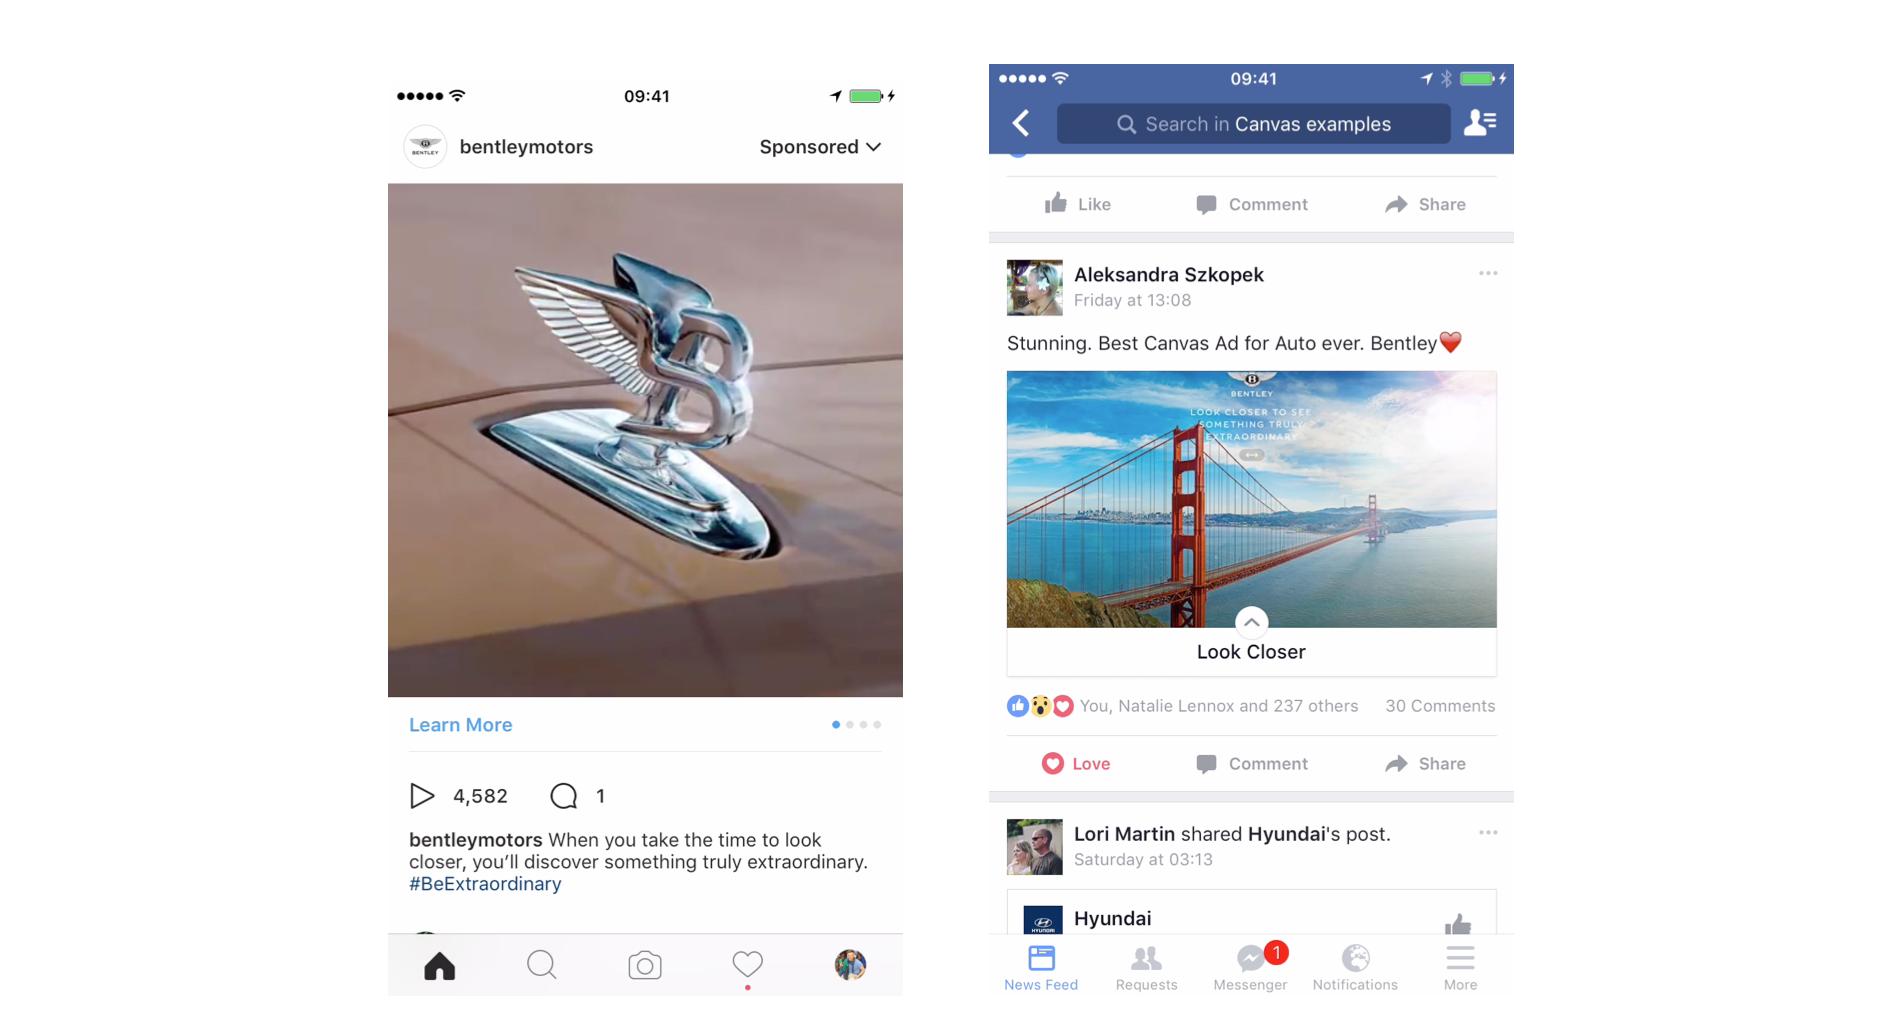 Instagram and Facebook content promoting Bentley's 53 billion pixel image of its Mulsanne model